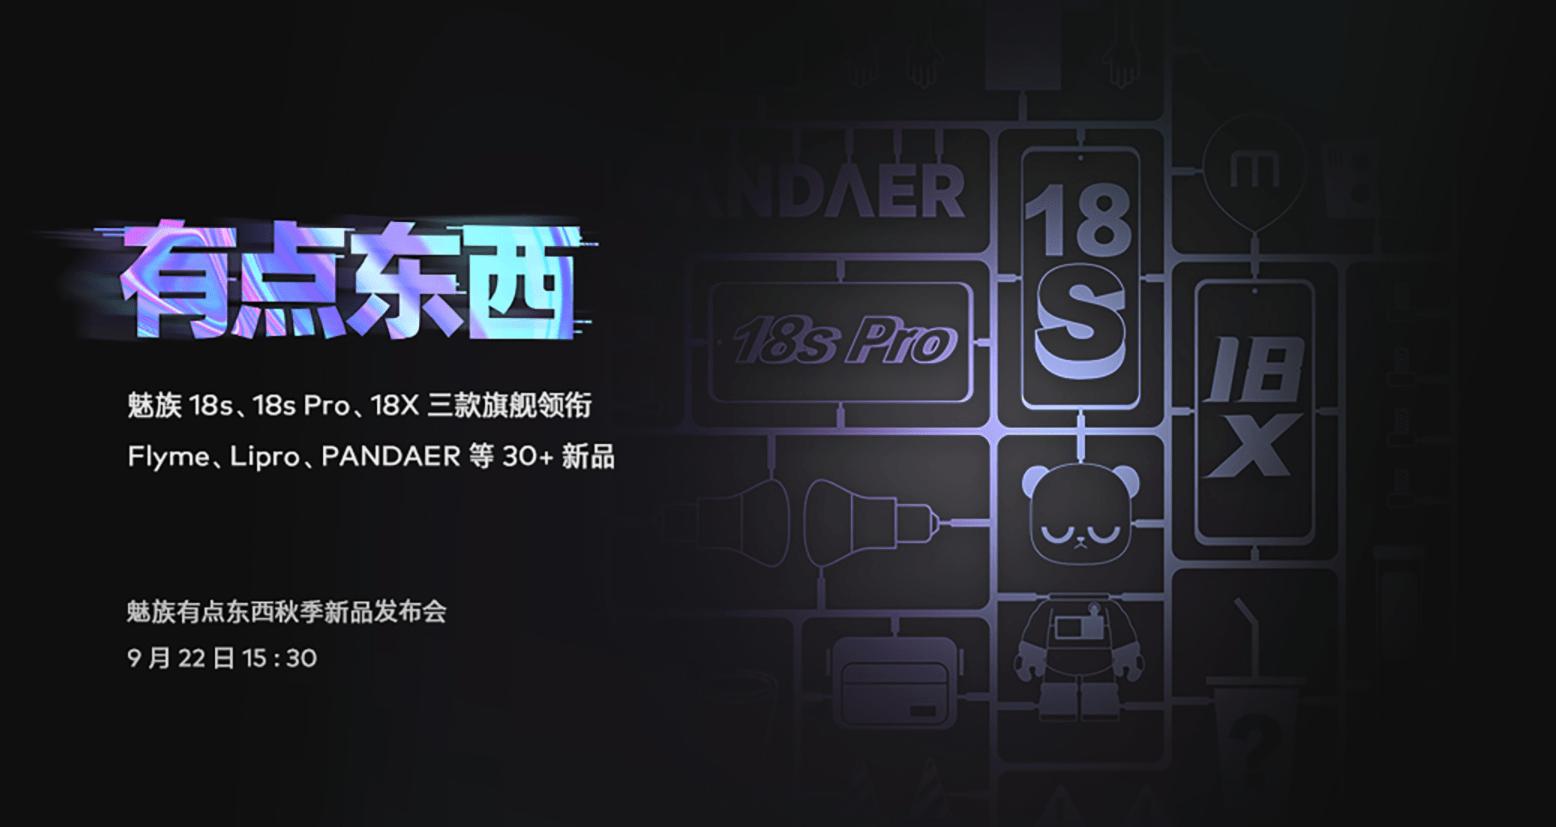 MEIZUが9月22日に新製品発表会を開催、Meizu 18s/18s Proや18Xなど30製品以上発表予定